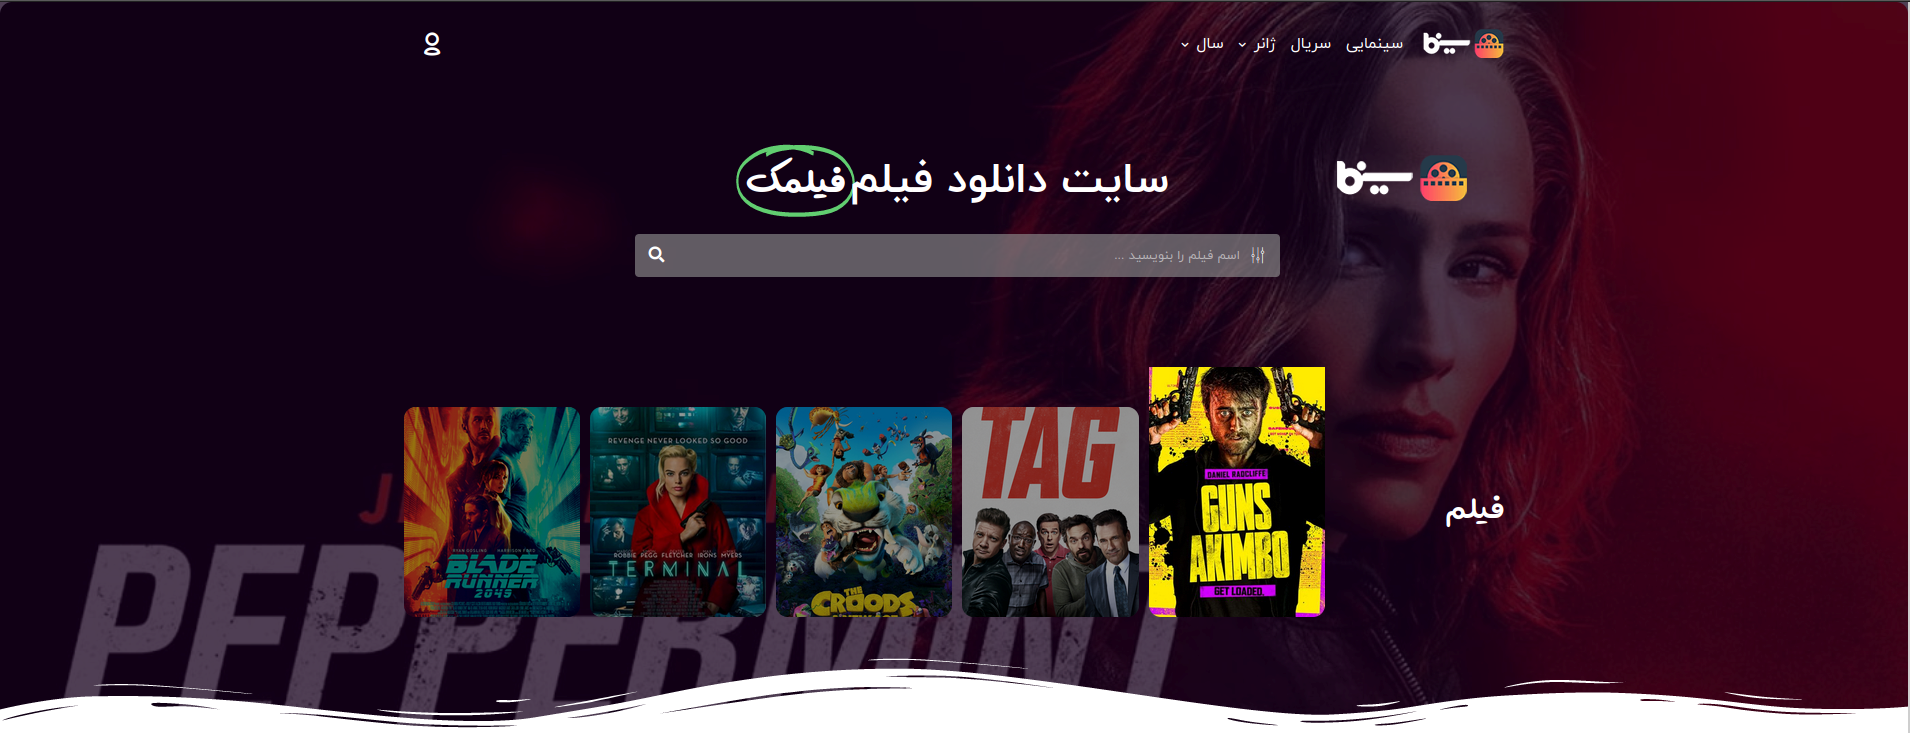 Photo of سایت فیلمک دانلود و تماشا آنلاین فیلم و سریال